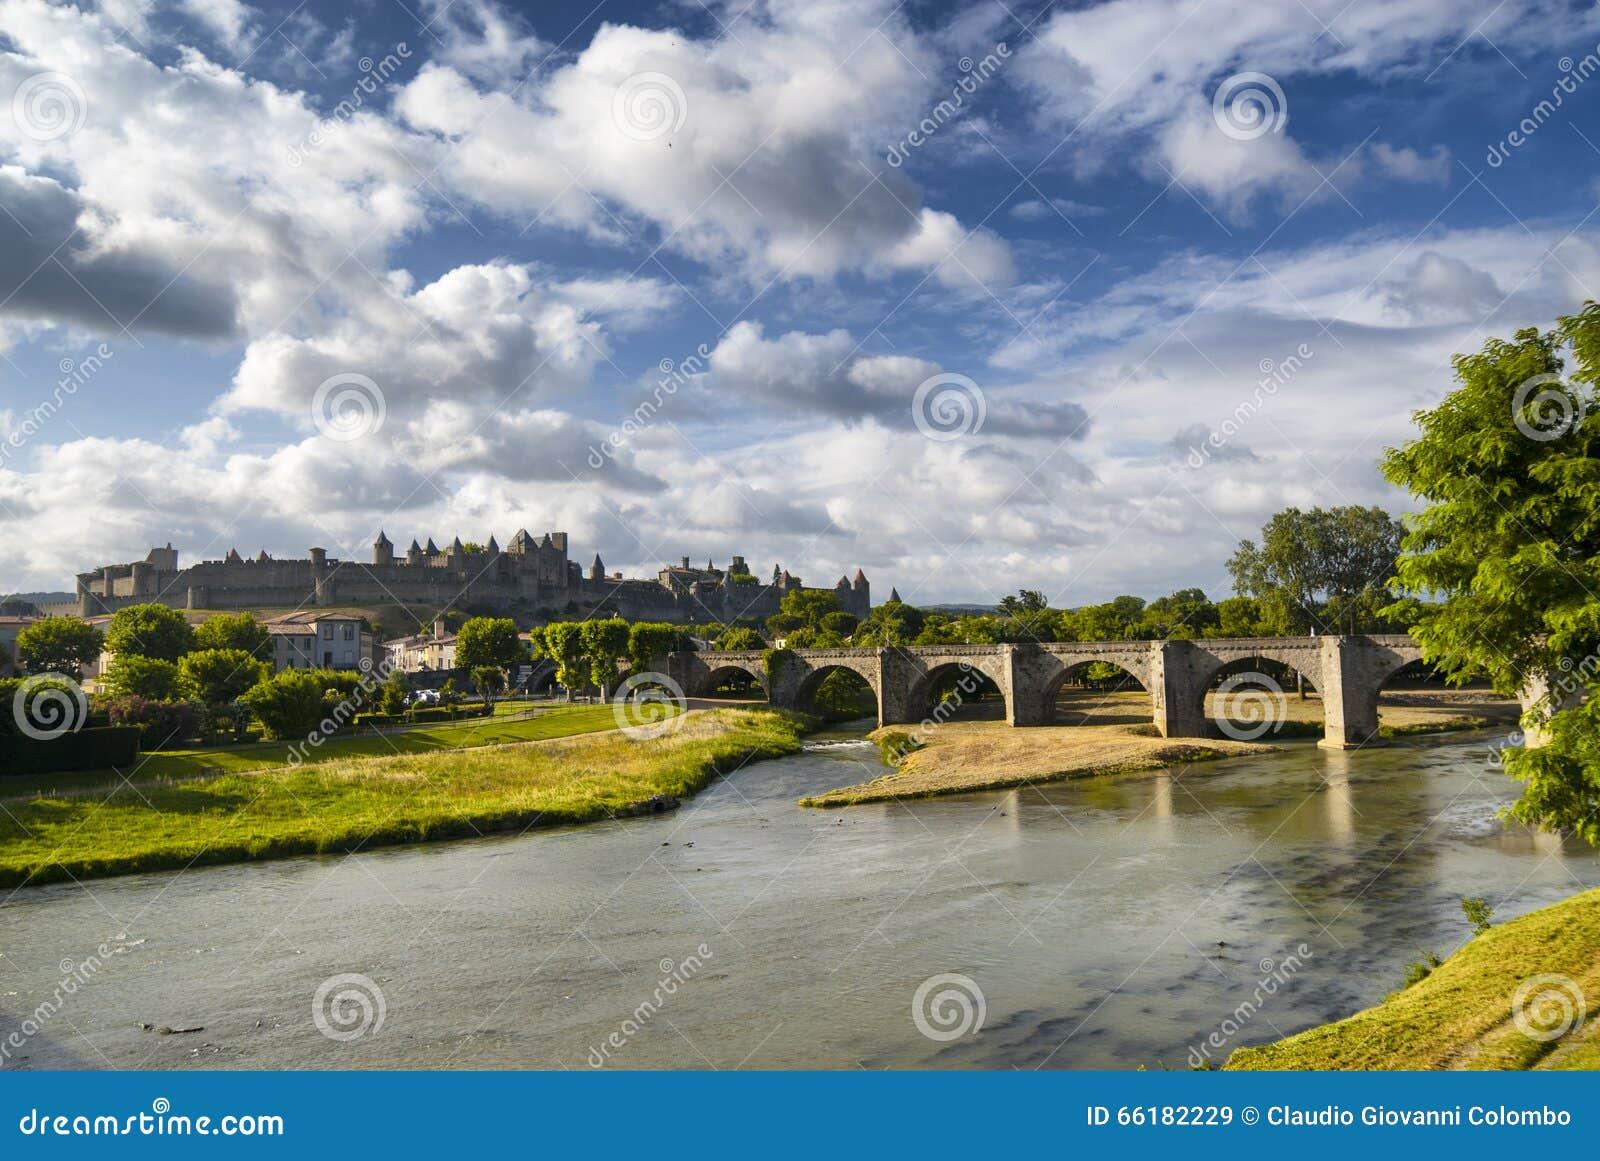 Carcasona (Aude, Francia)